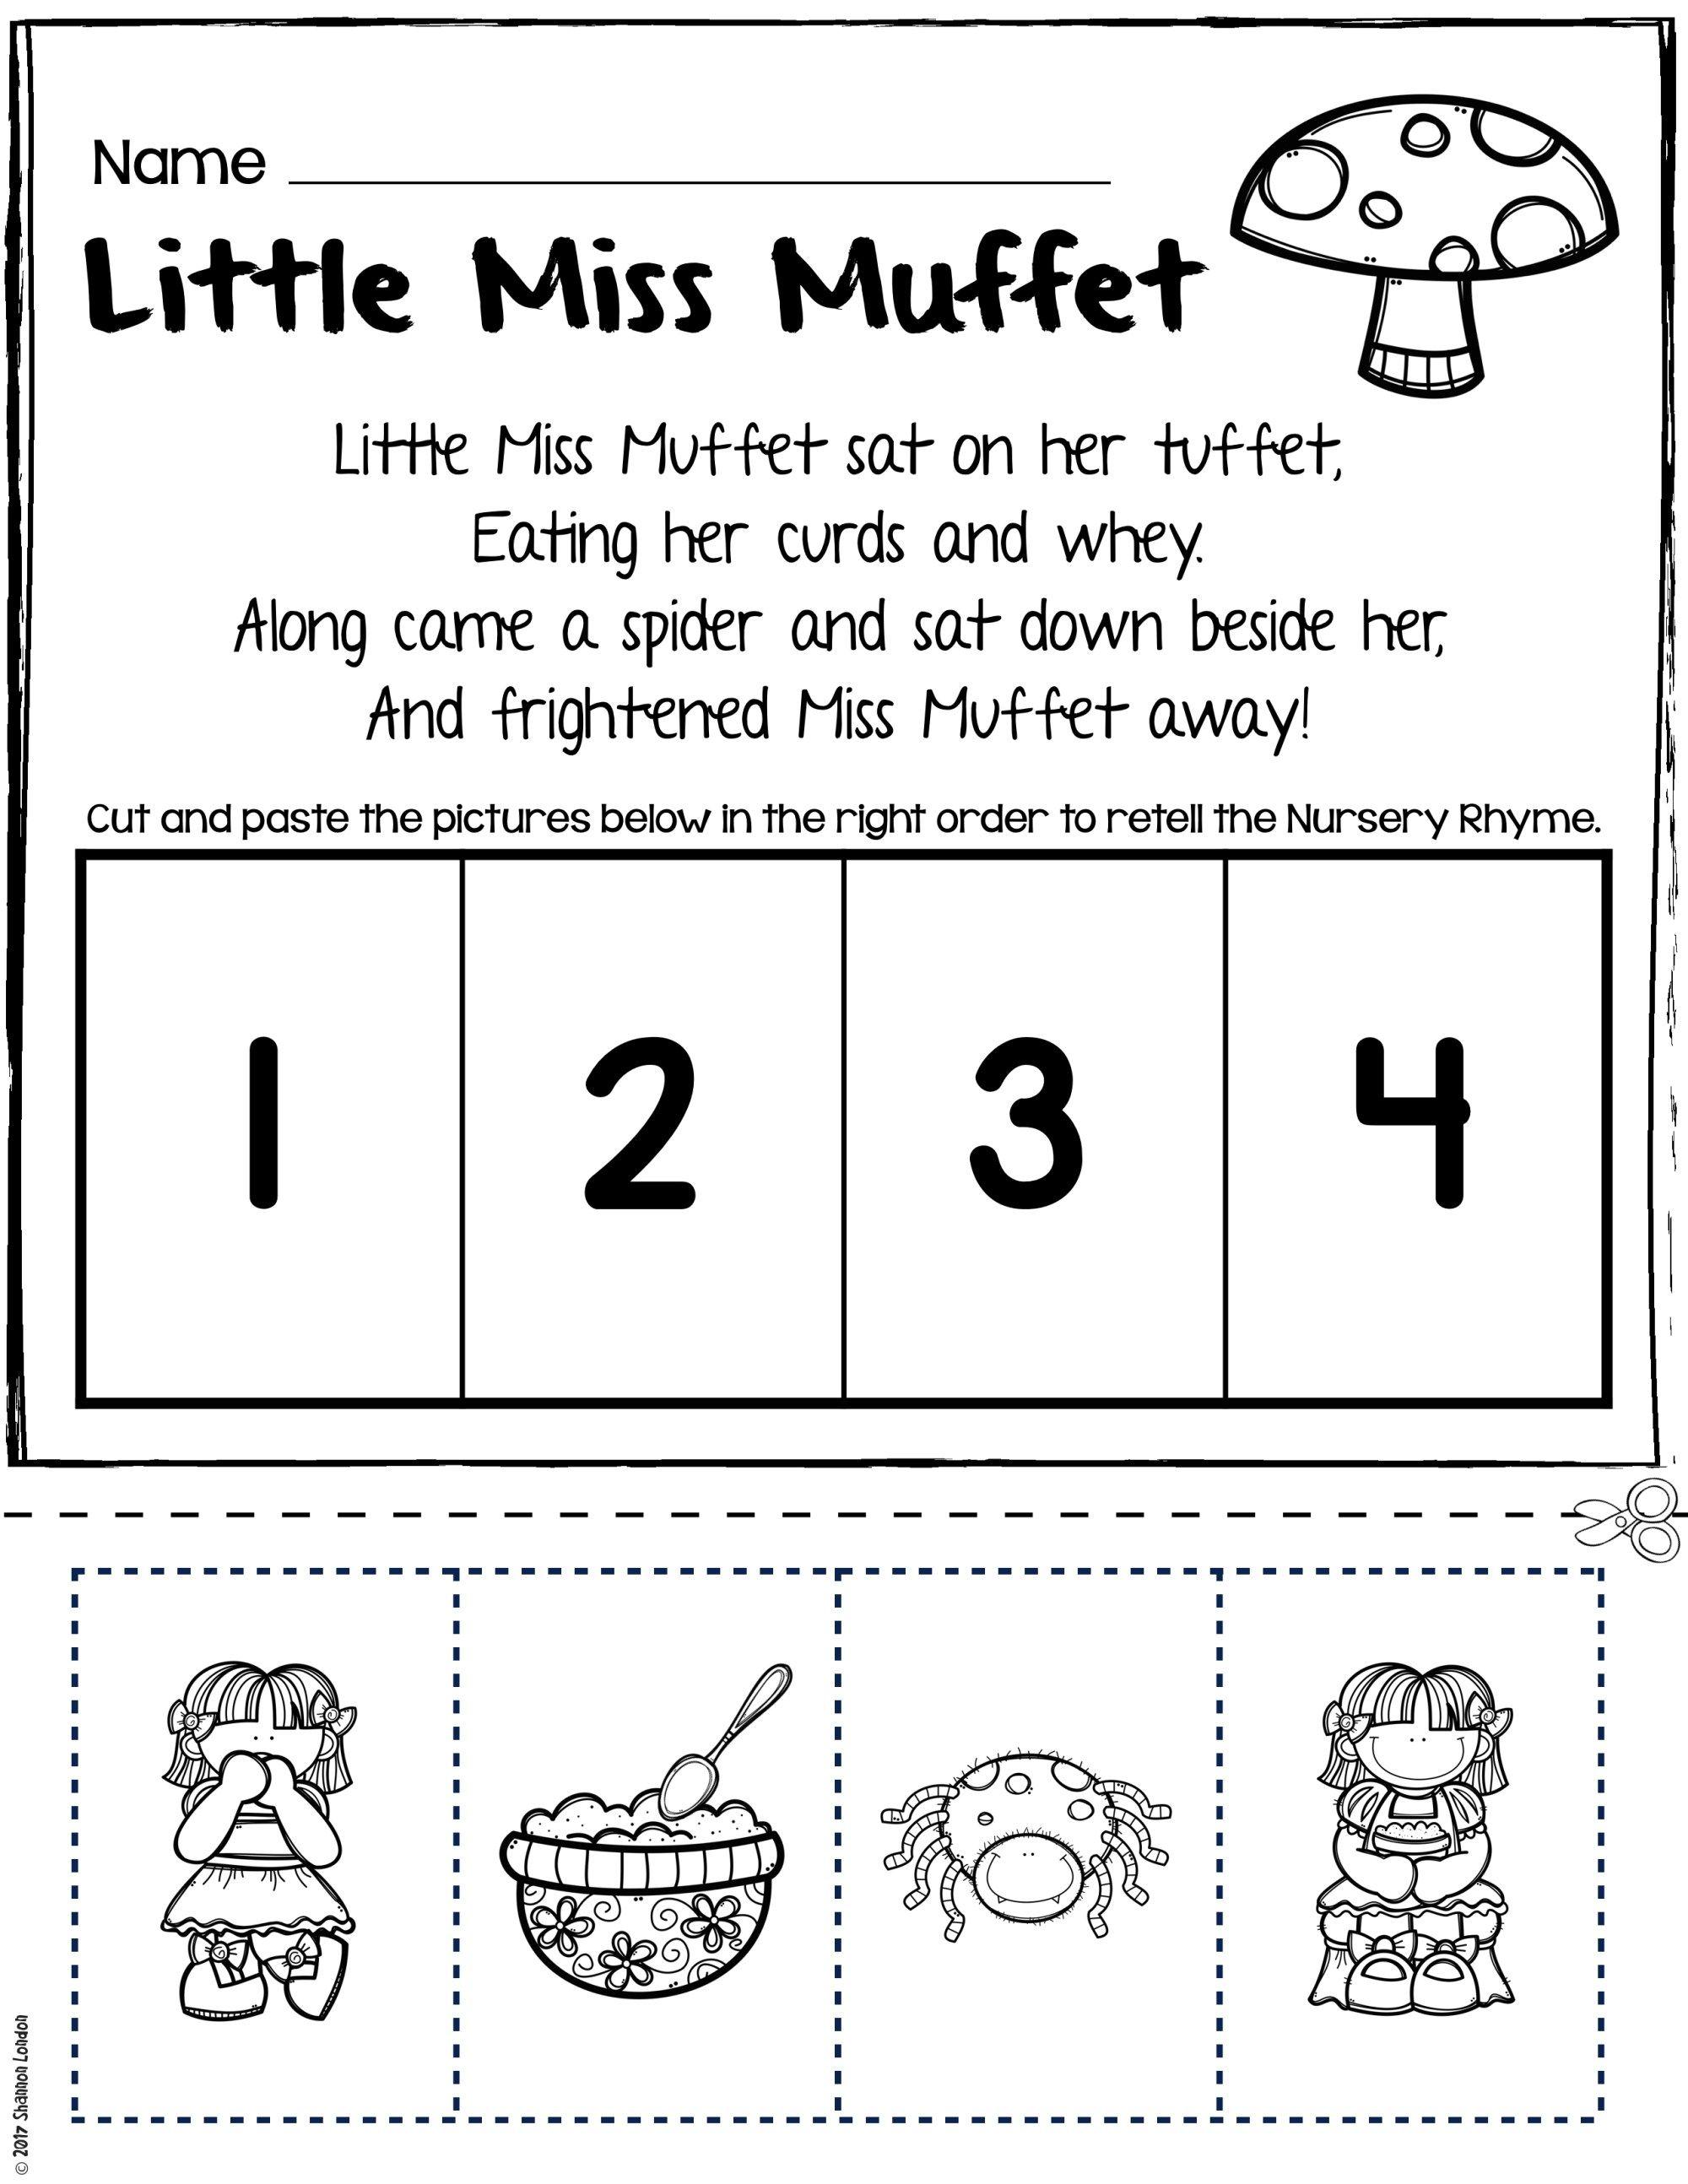 Teach Story Retelling With Nursery Rhymes Rhyming Worksheet Rhyming Activities Nursery Rhymes Activities